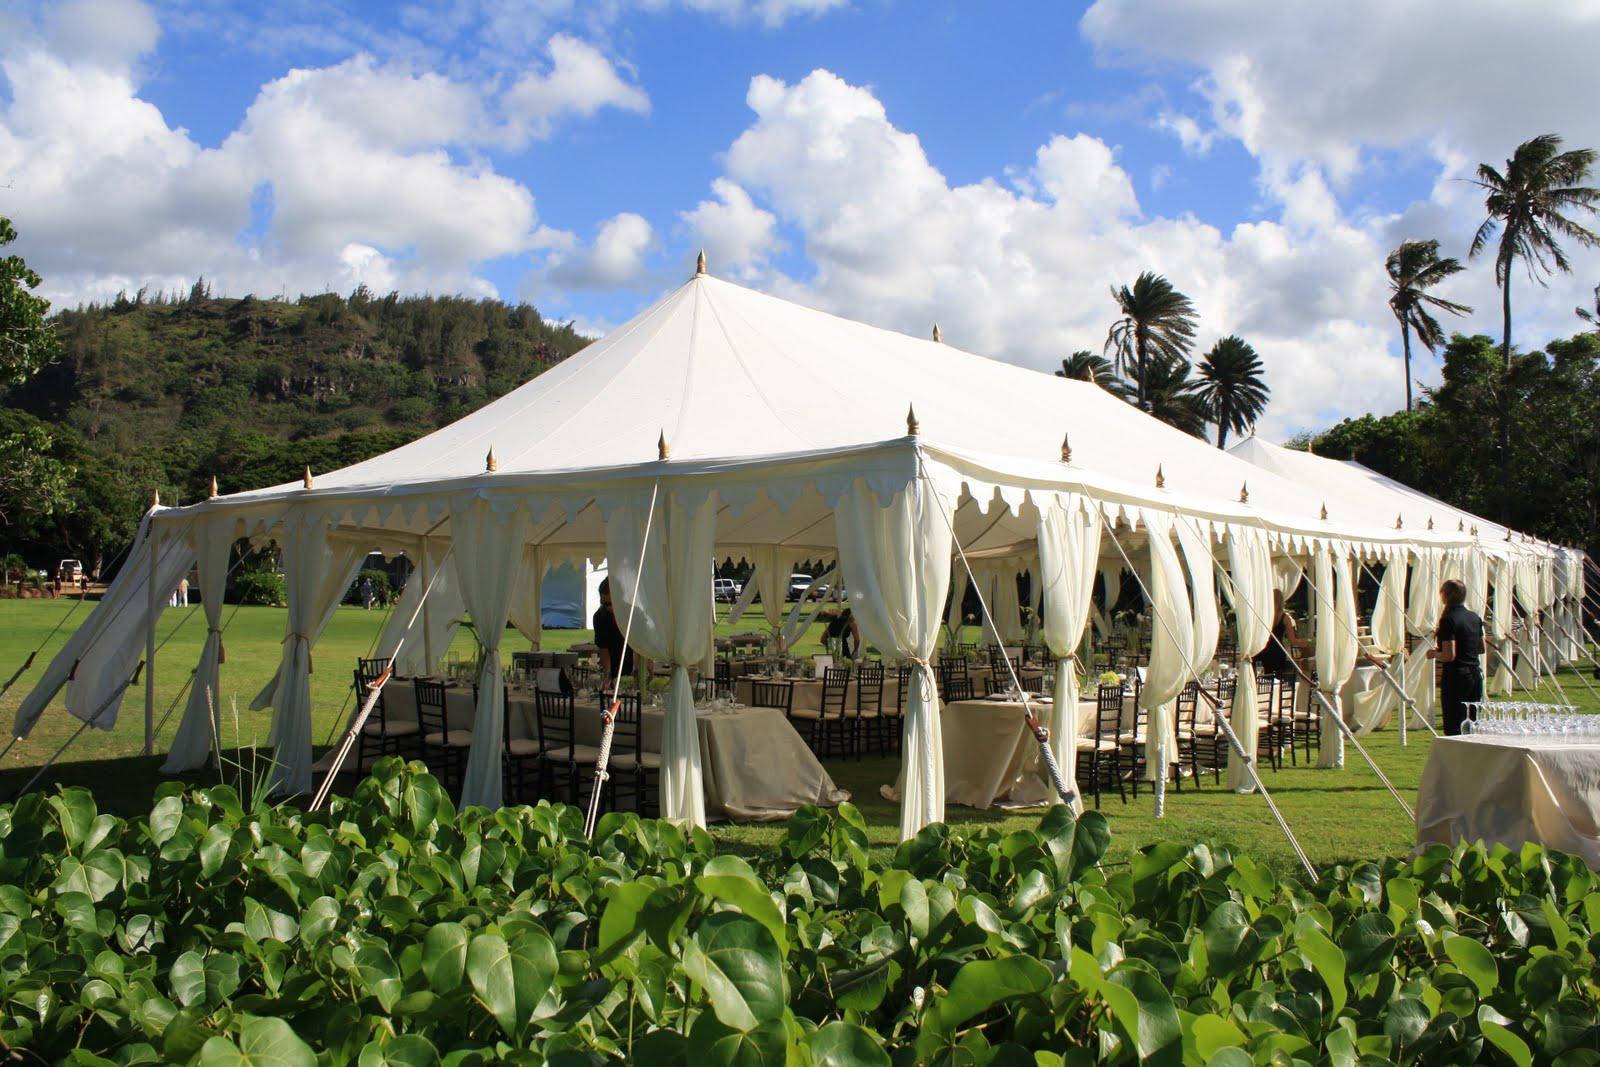 destination weddings - step-up your destination wedding decor with